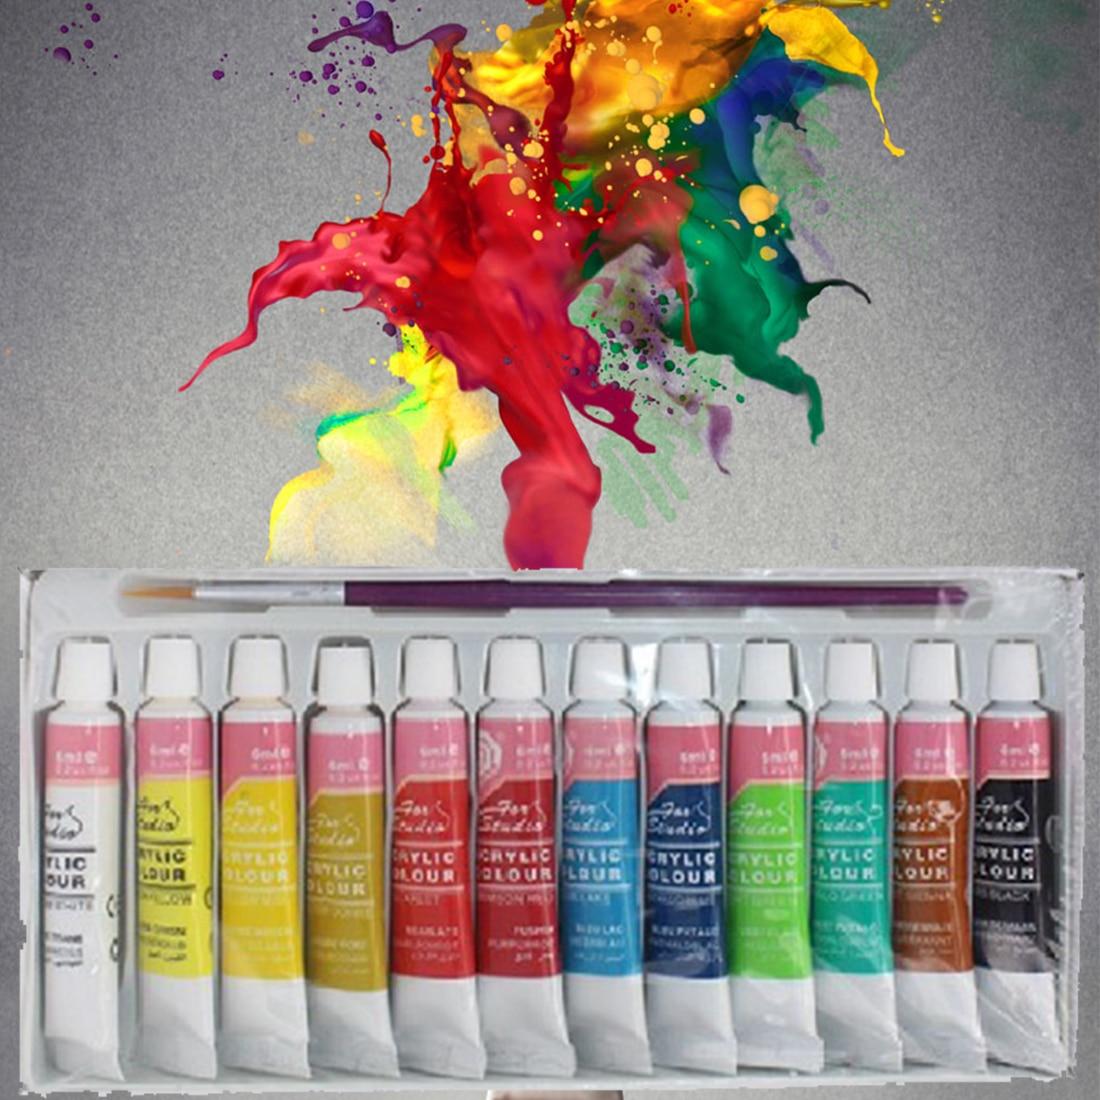 FangNymph Akrilik Boya 12 Colors Acrylic Paints Set Hand Painted Wall Painting Textile Paint Brightly Colored Art Supplies